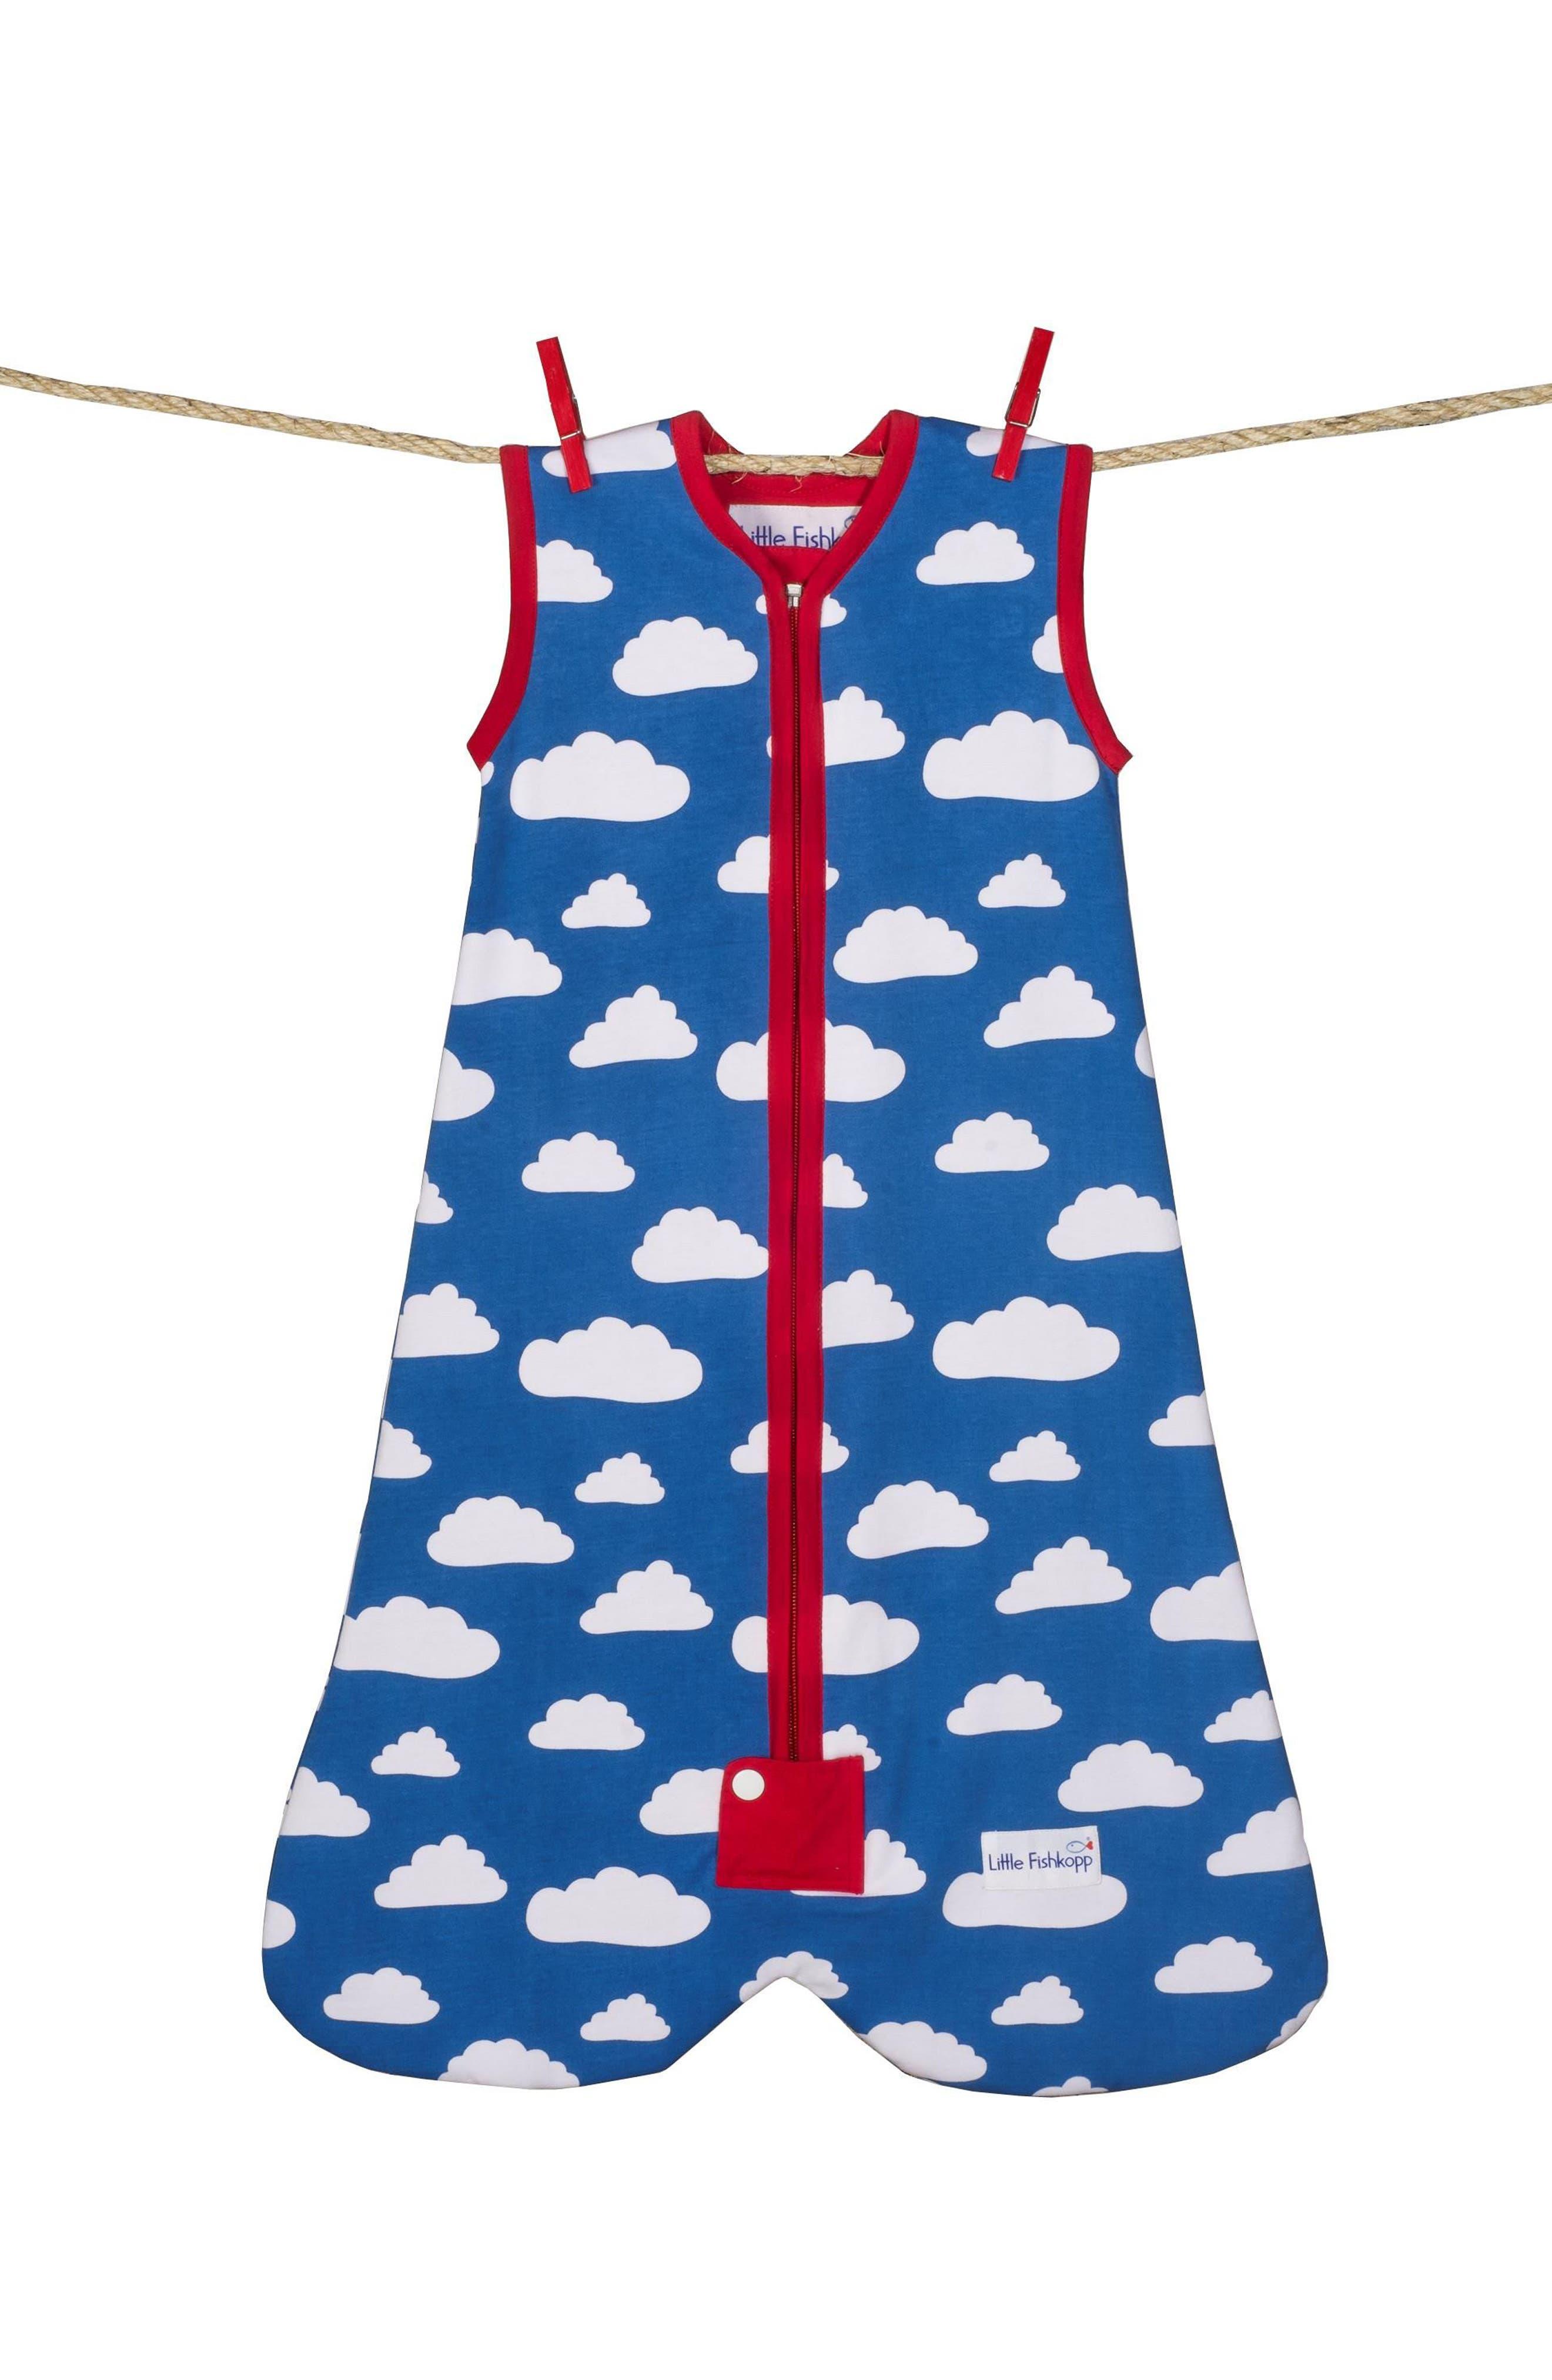 Clouds Organic Cotton Wearable Blanket,                         Main,                         color, Cloud Print